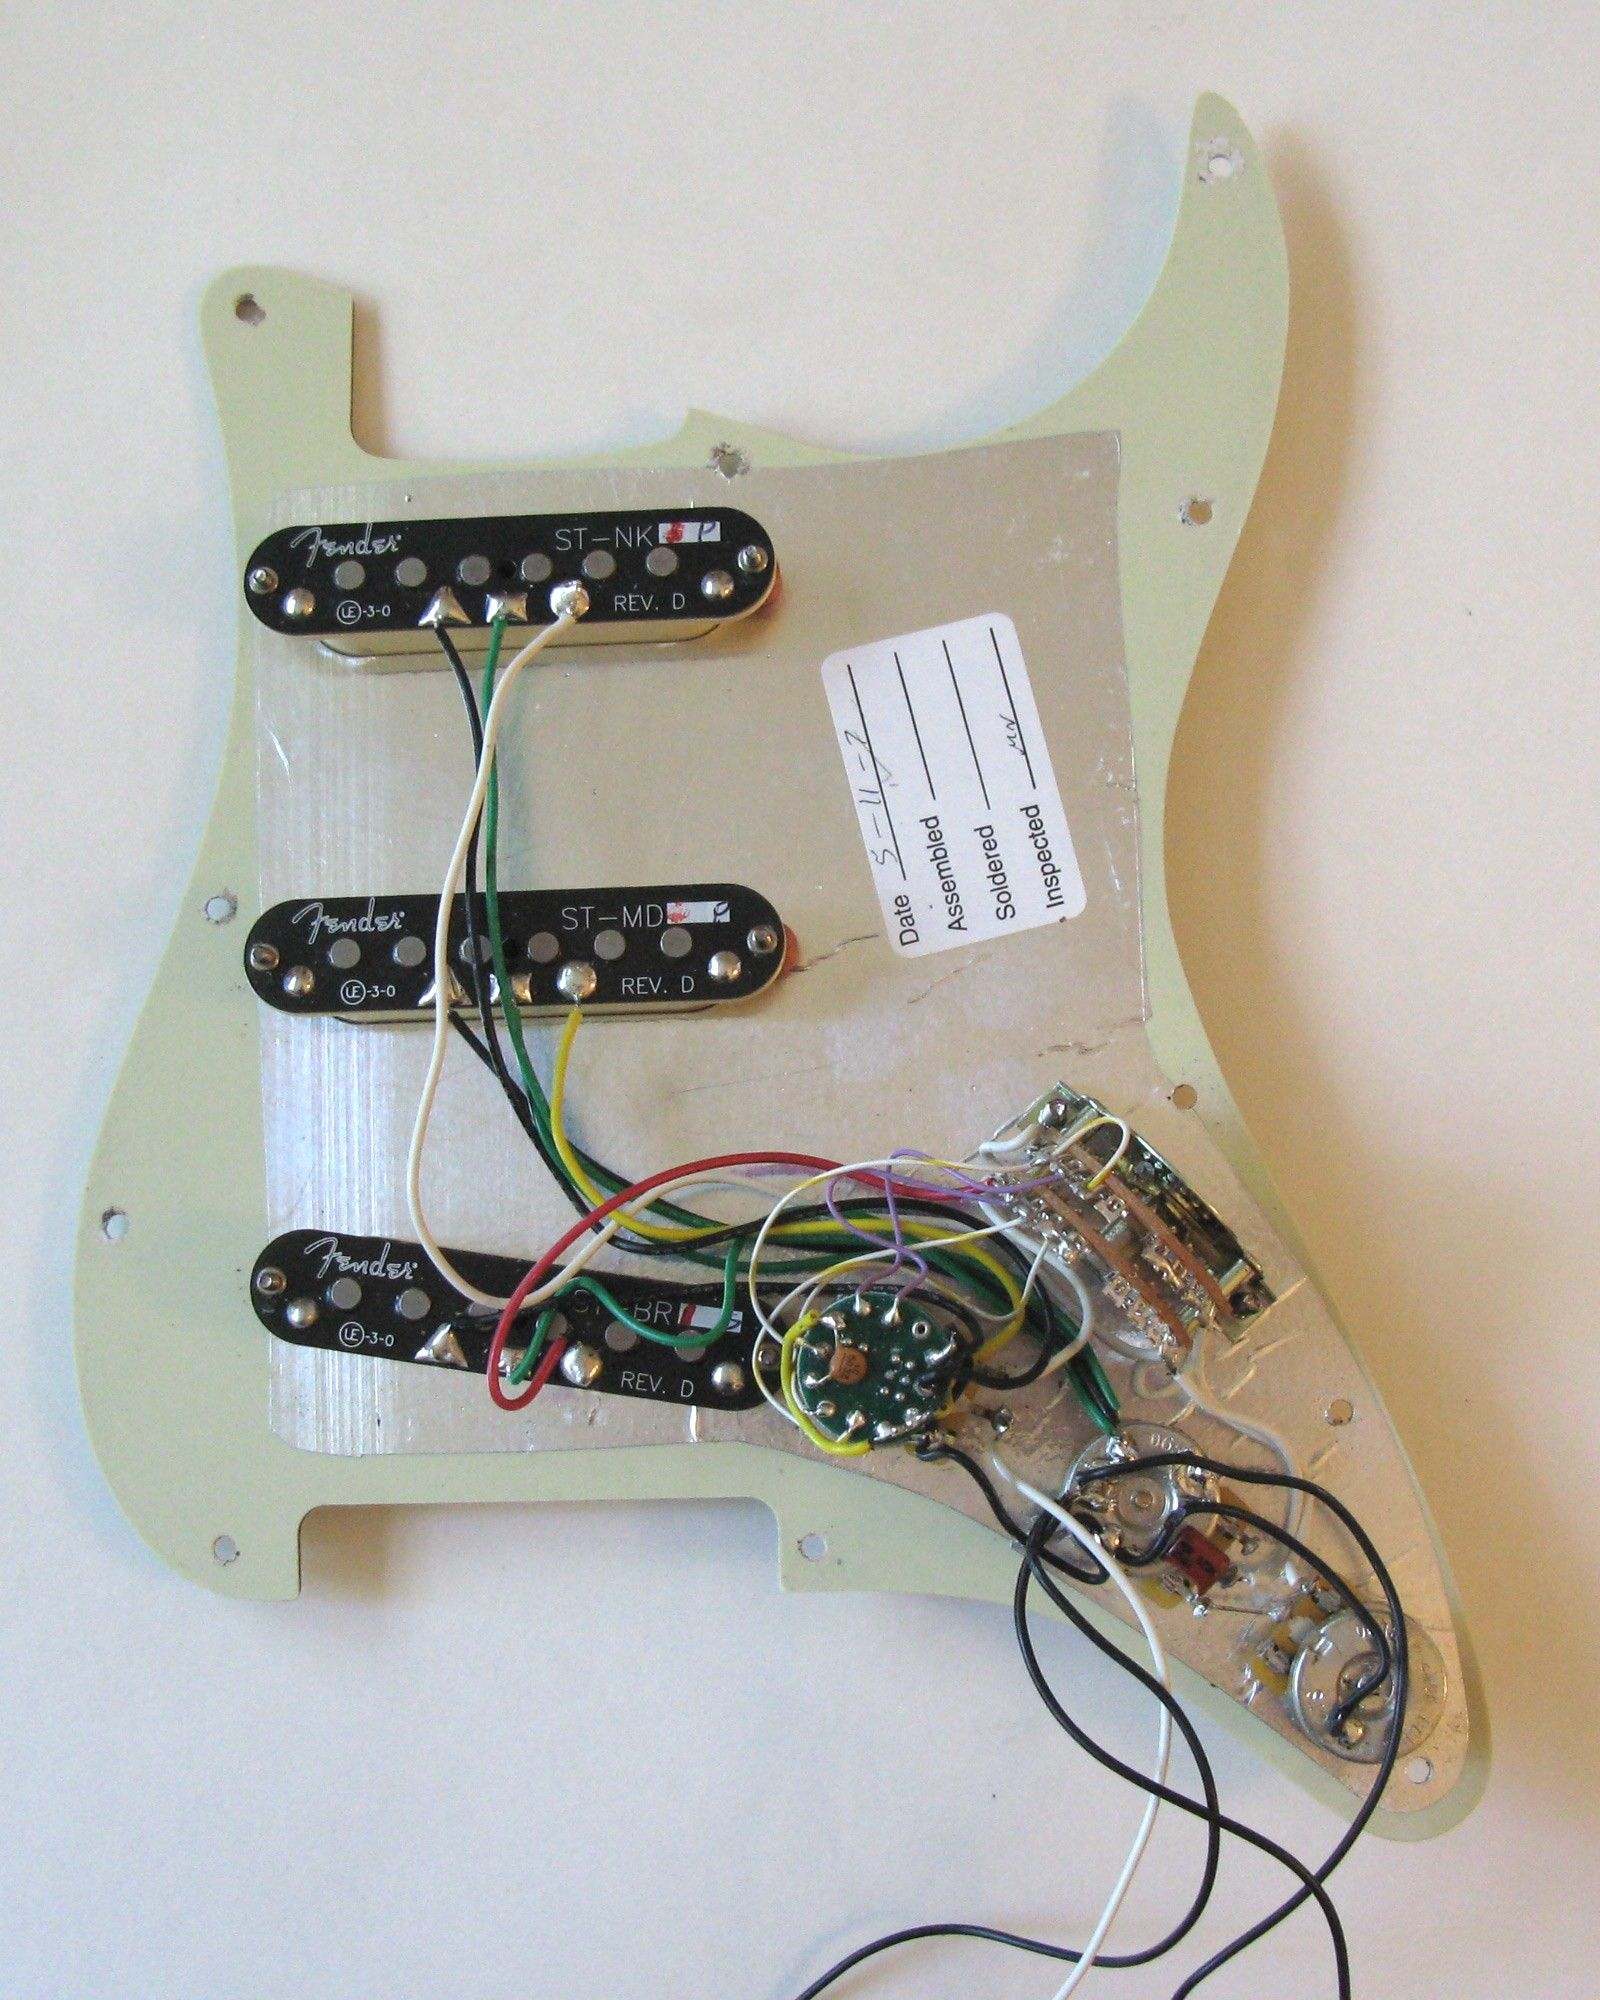 unique wiring diagram stratocaster guitar #diagram #diagramsample  #diagramtemplate #wiringdiagram #diagramchart #worksheet #worksheettemplate